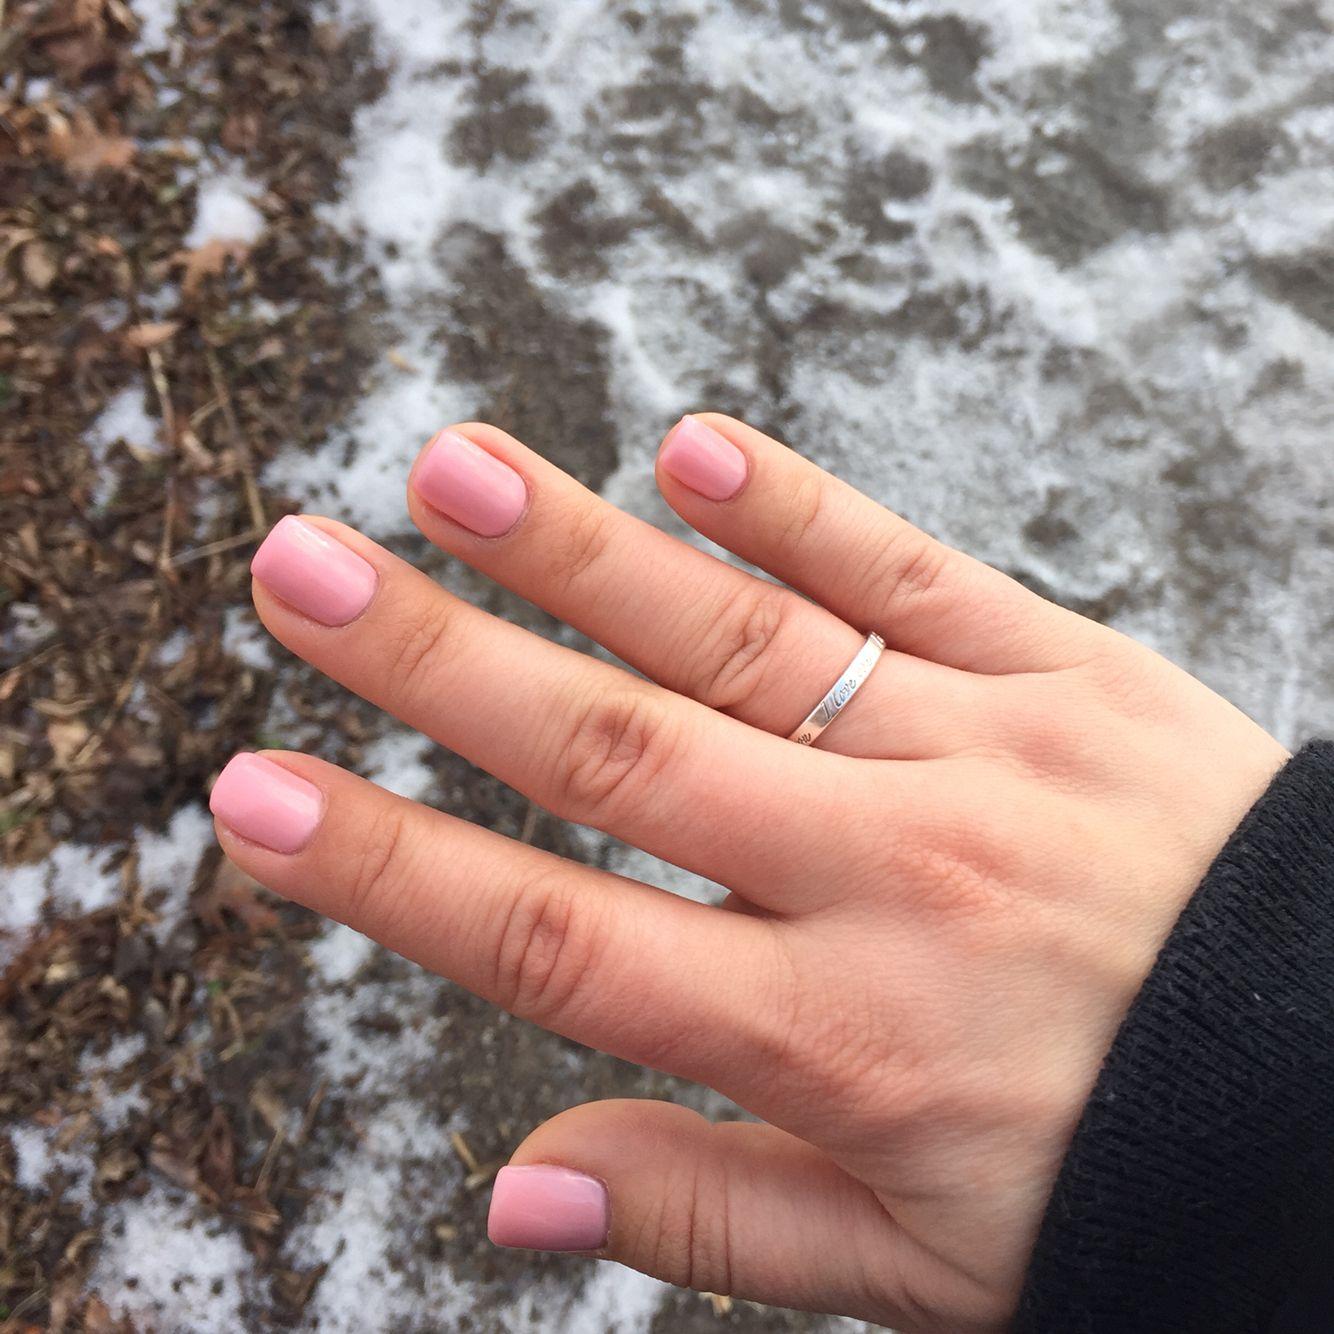 Pink Gel Nails - OPI axxium gel : \